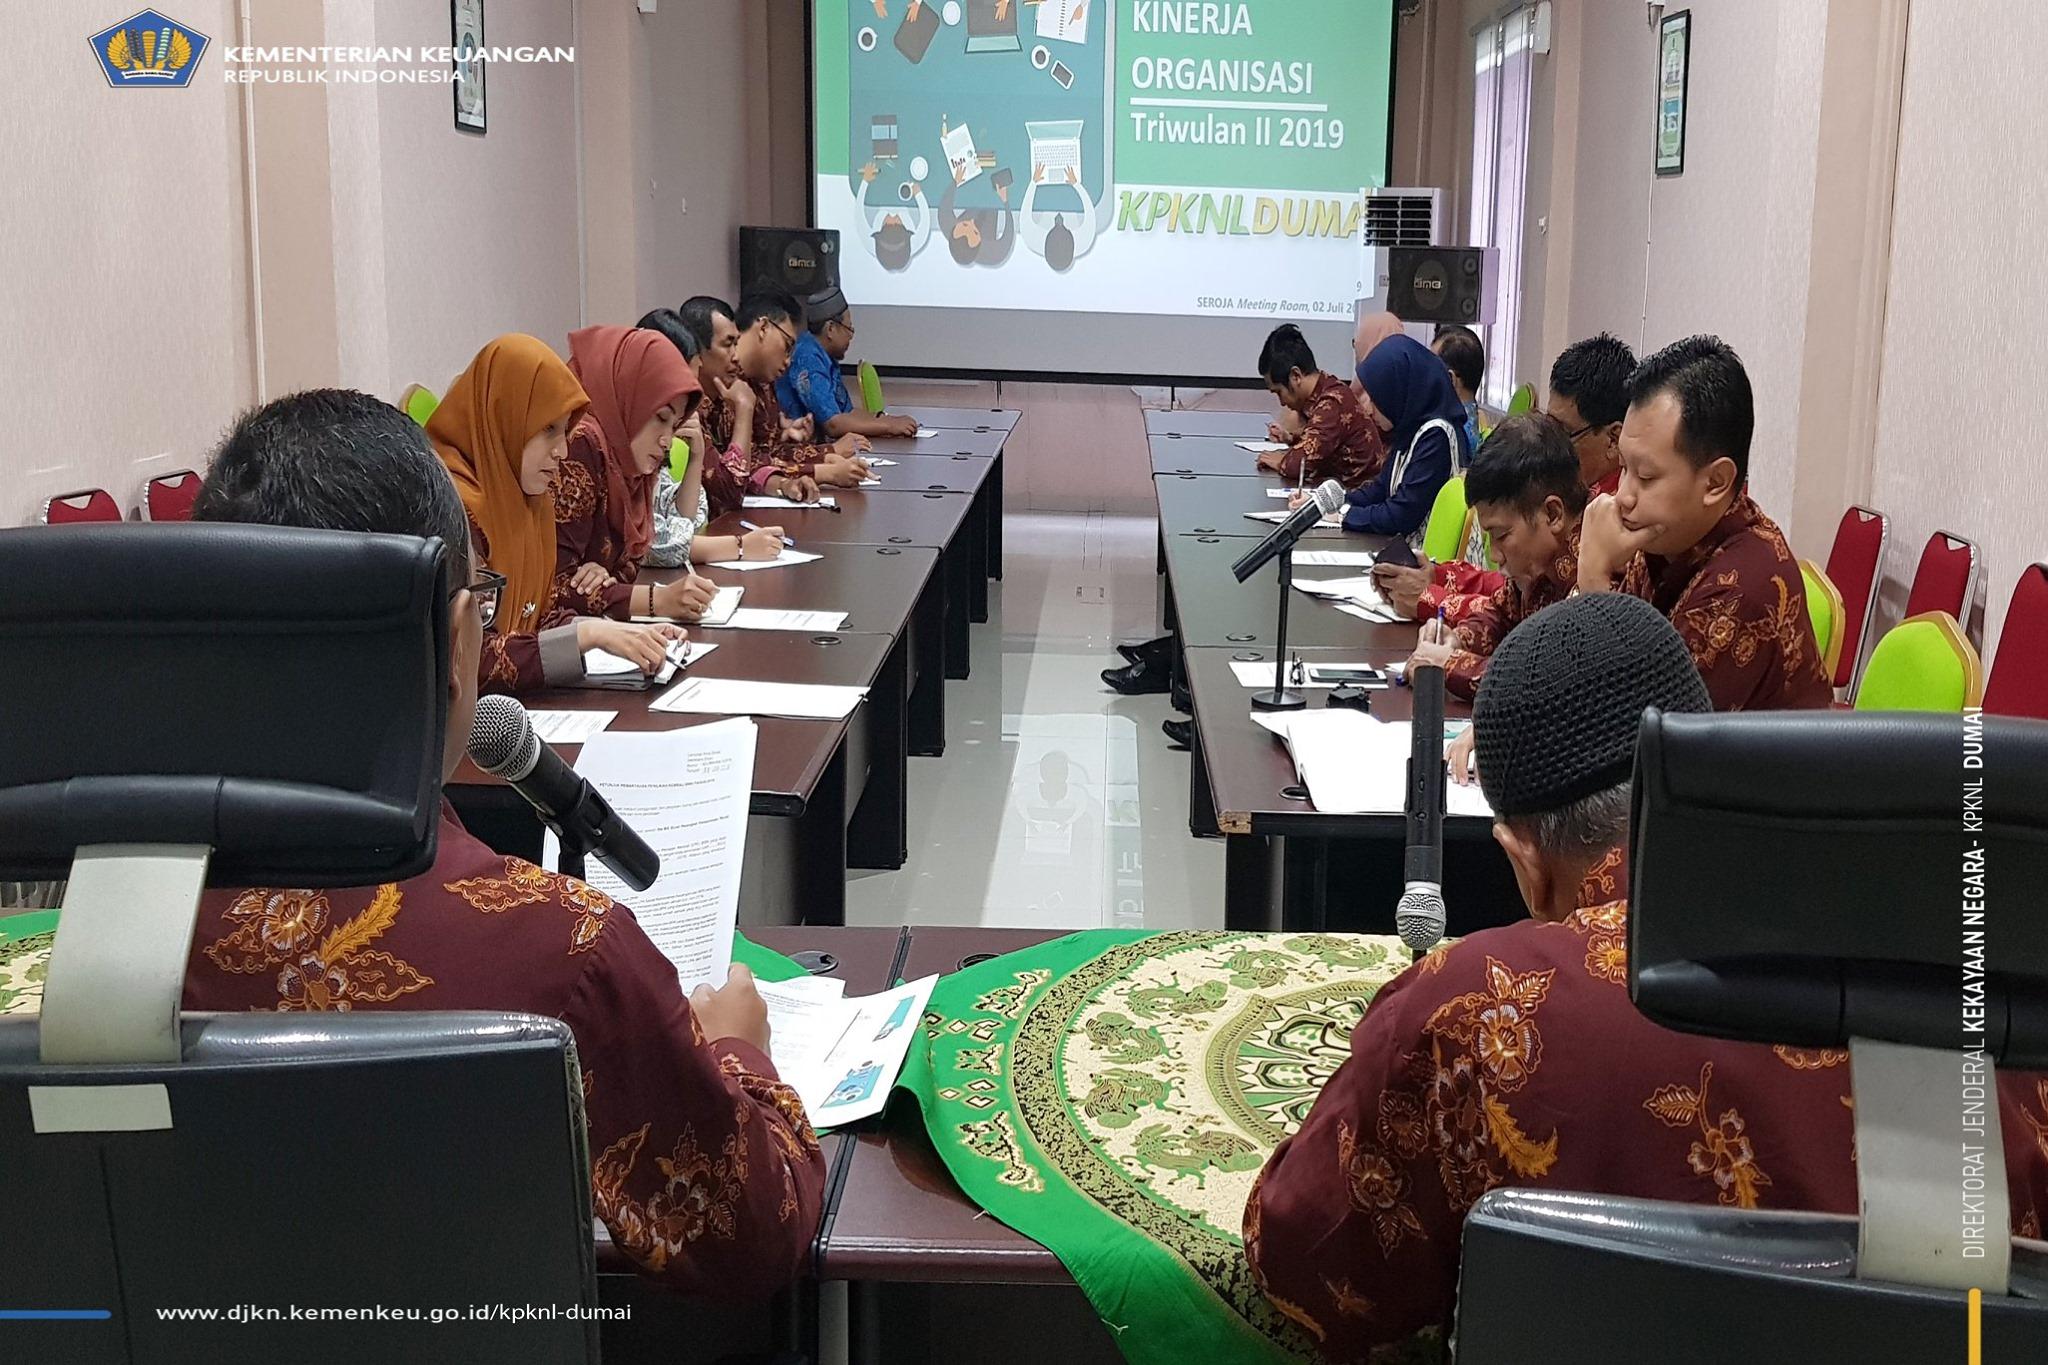 DKO Triwulan II tahun 2019, KPKNL Dumai Bisa!